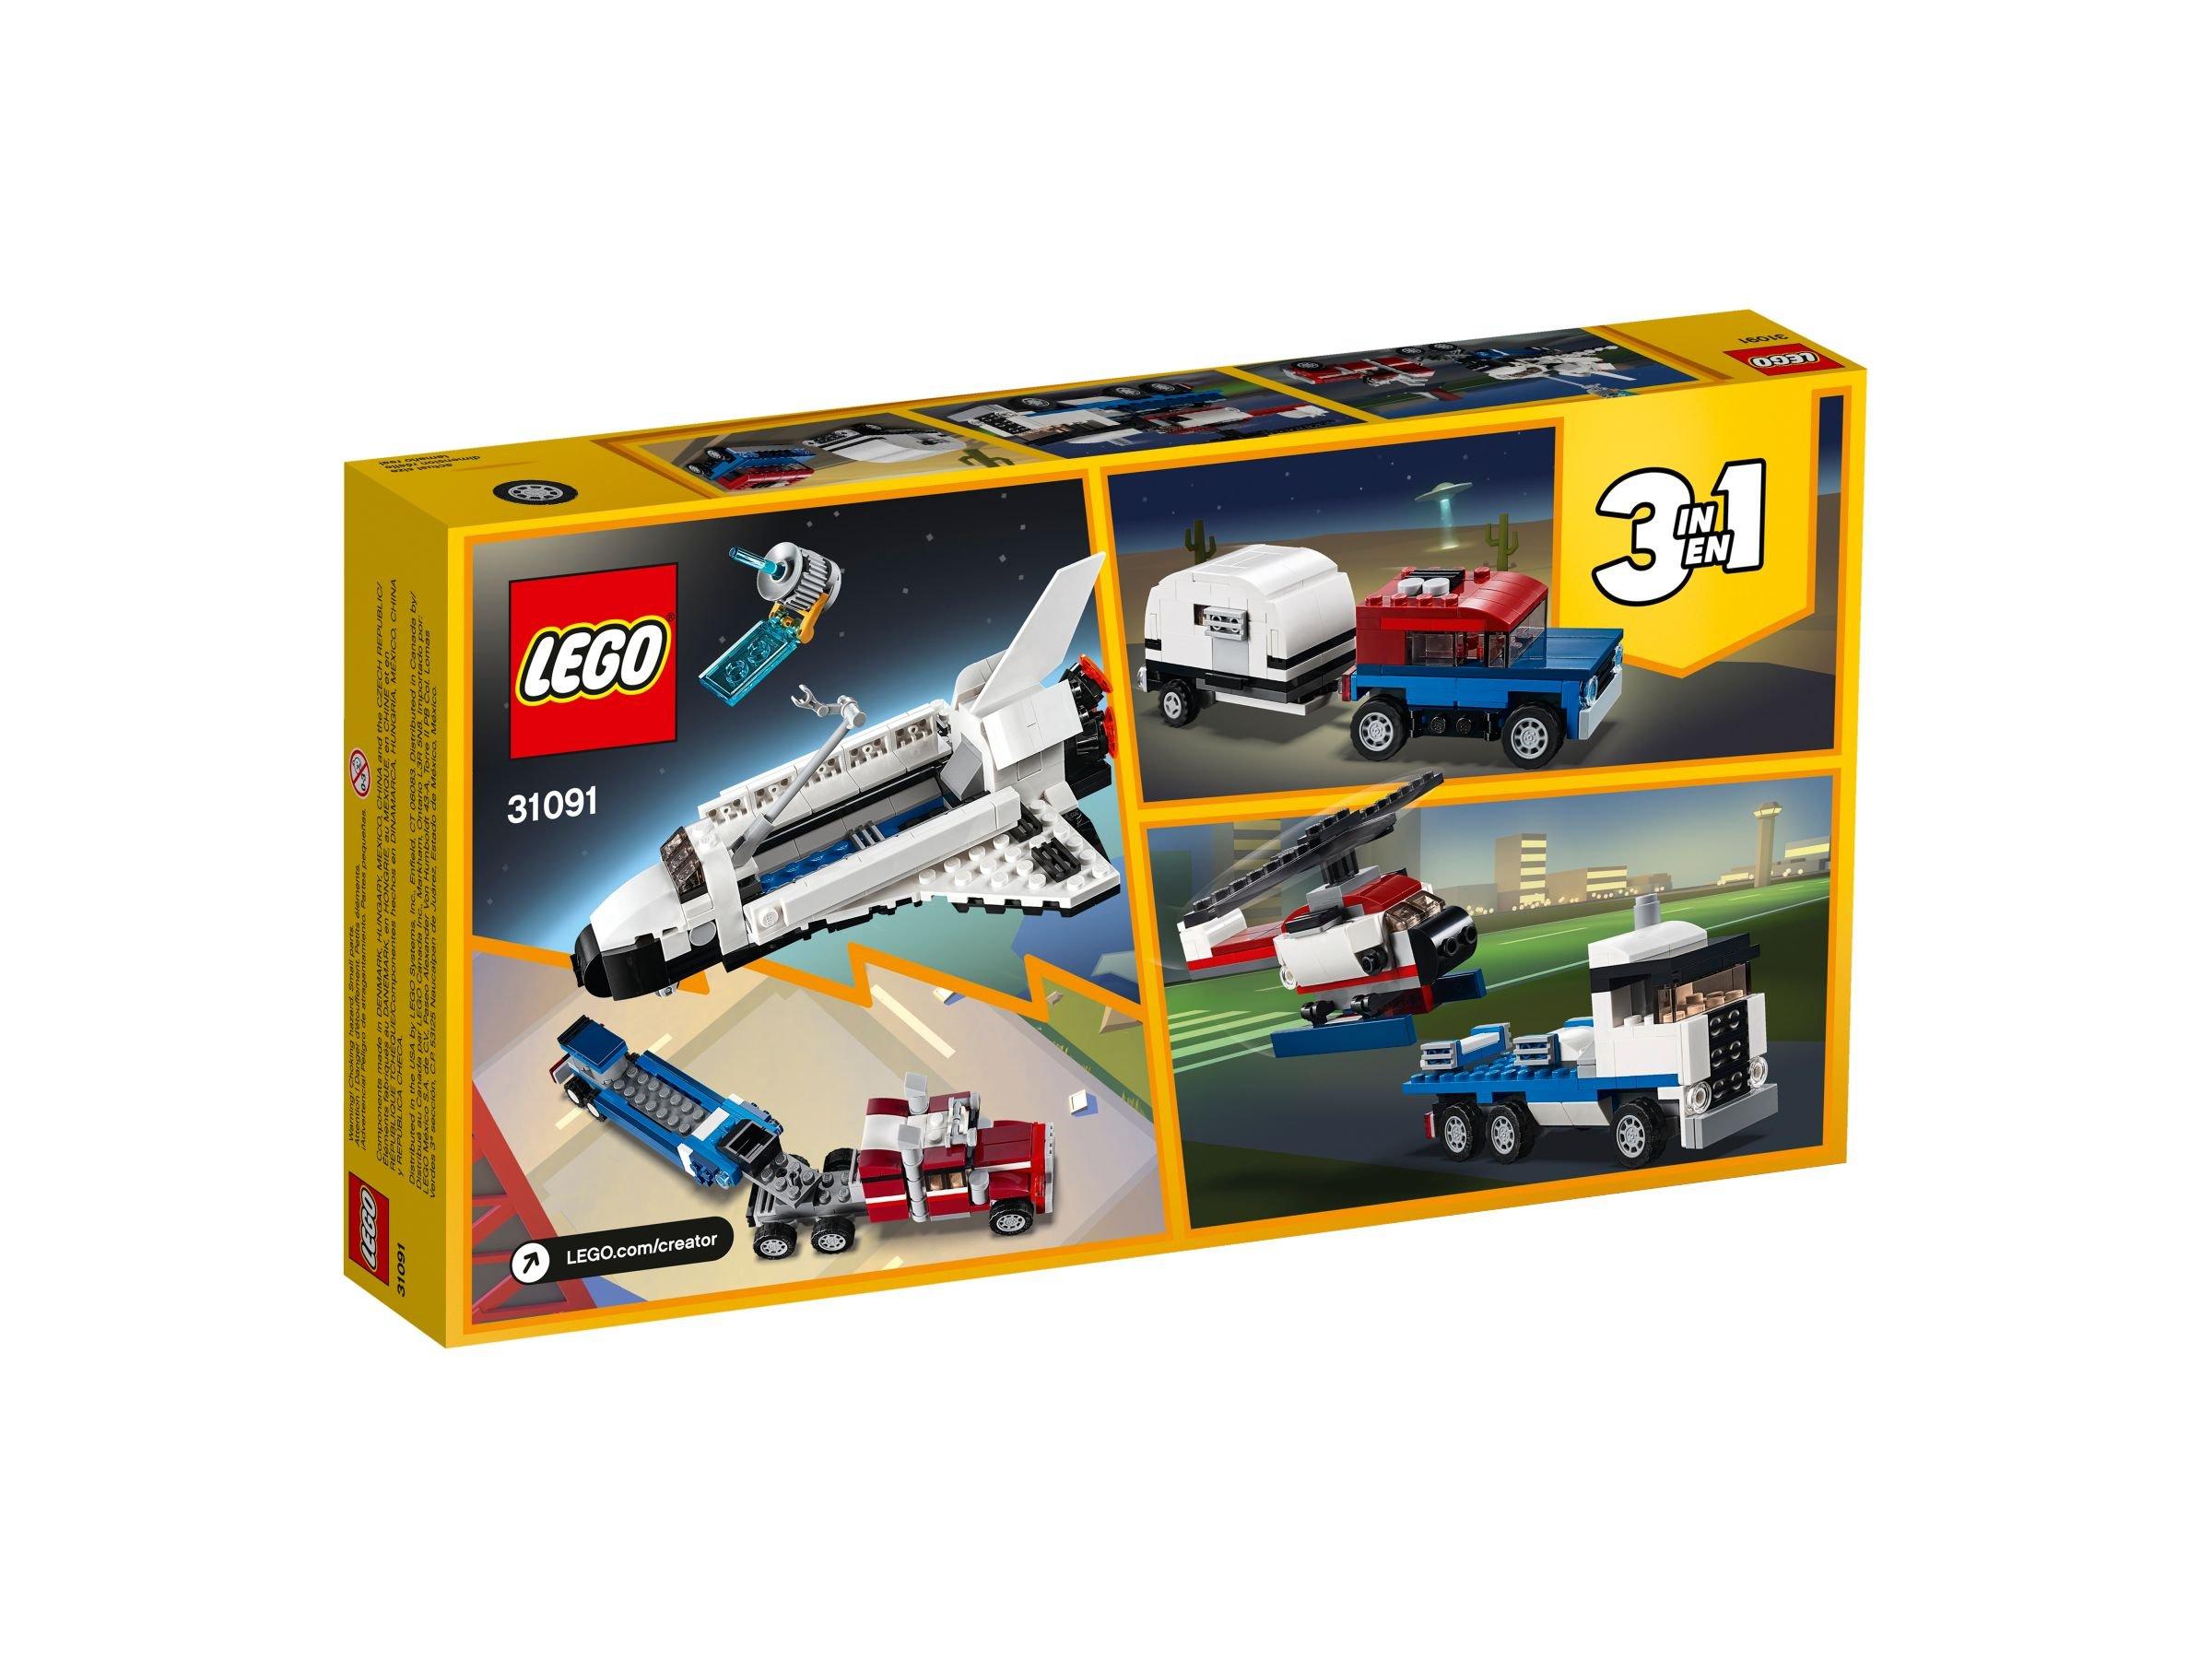 lego space shuttle alt bauanleitung - photo #26